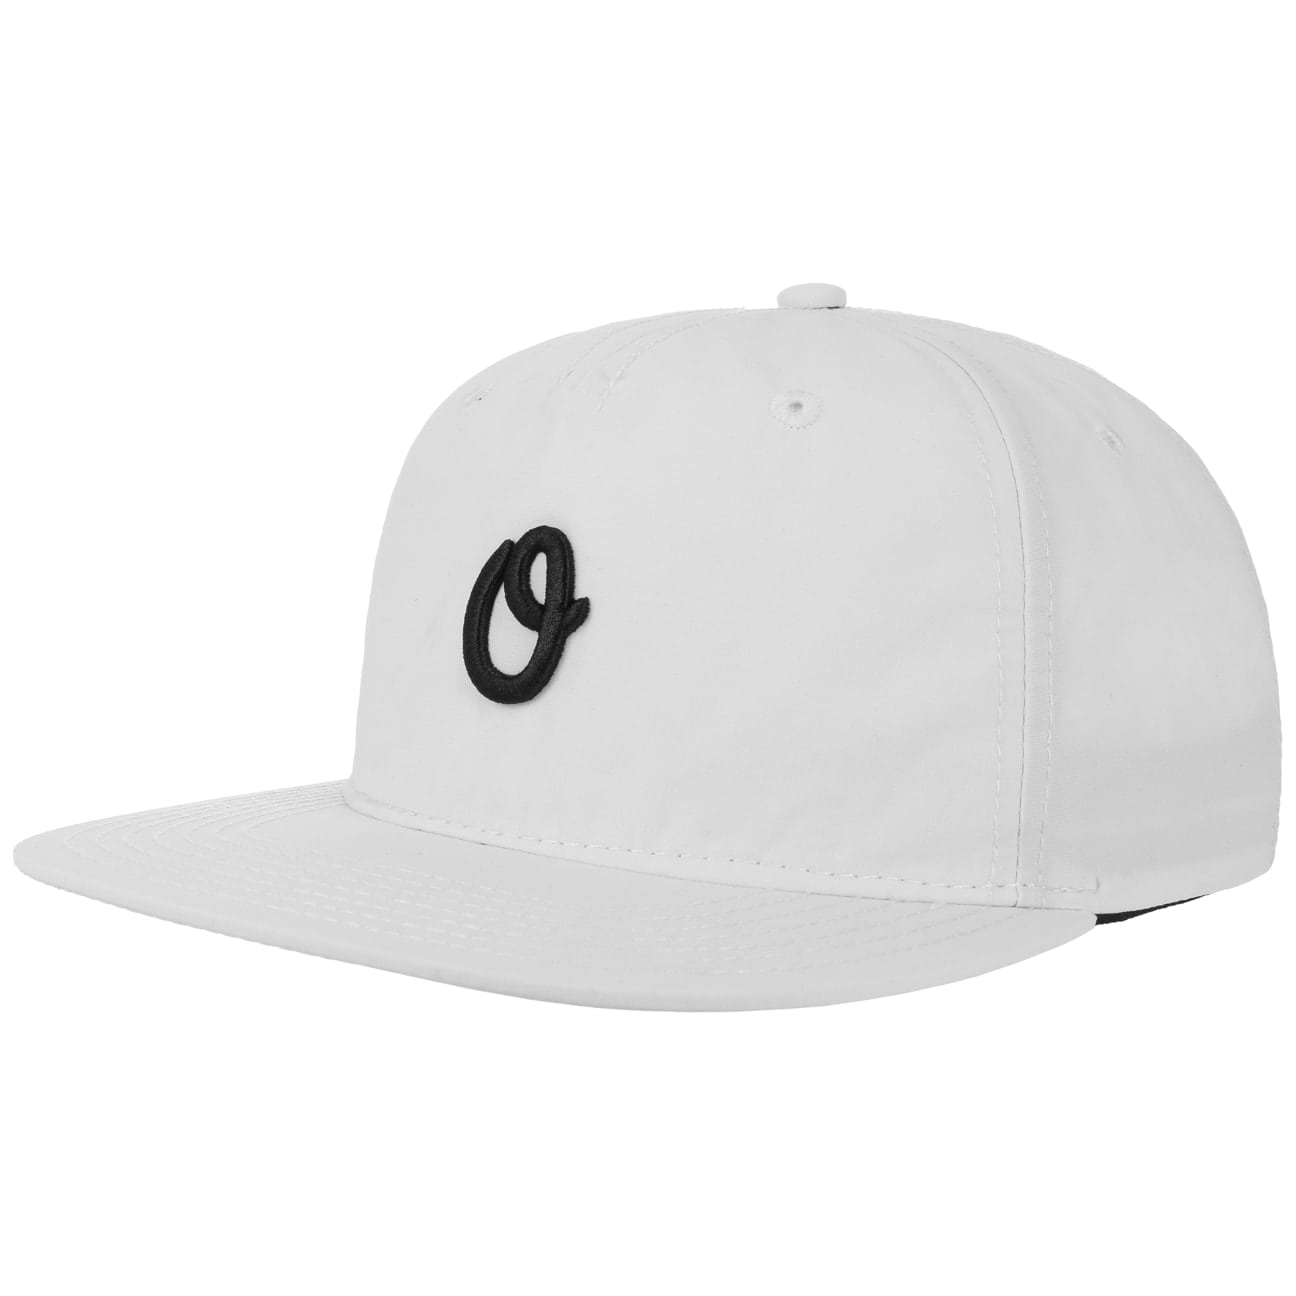 Casquette Olo EvDay by Official Headwear  baseball cap